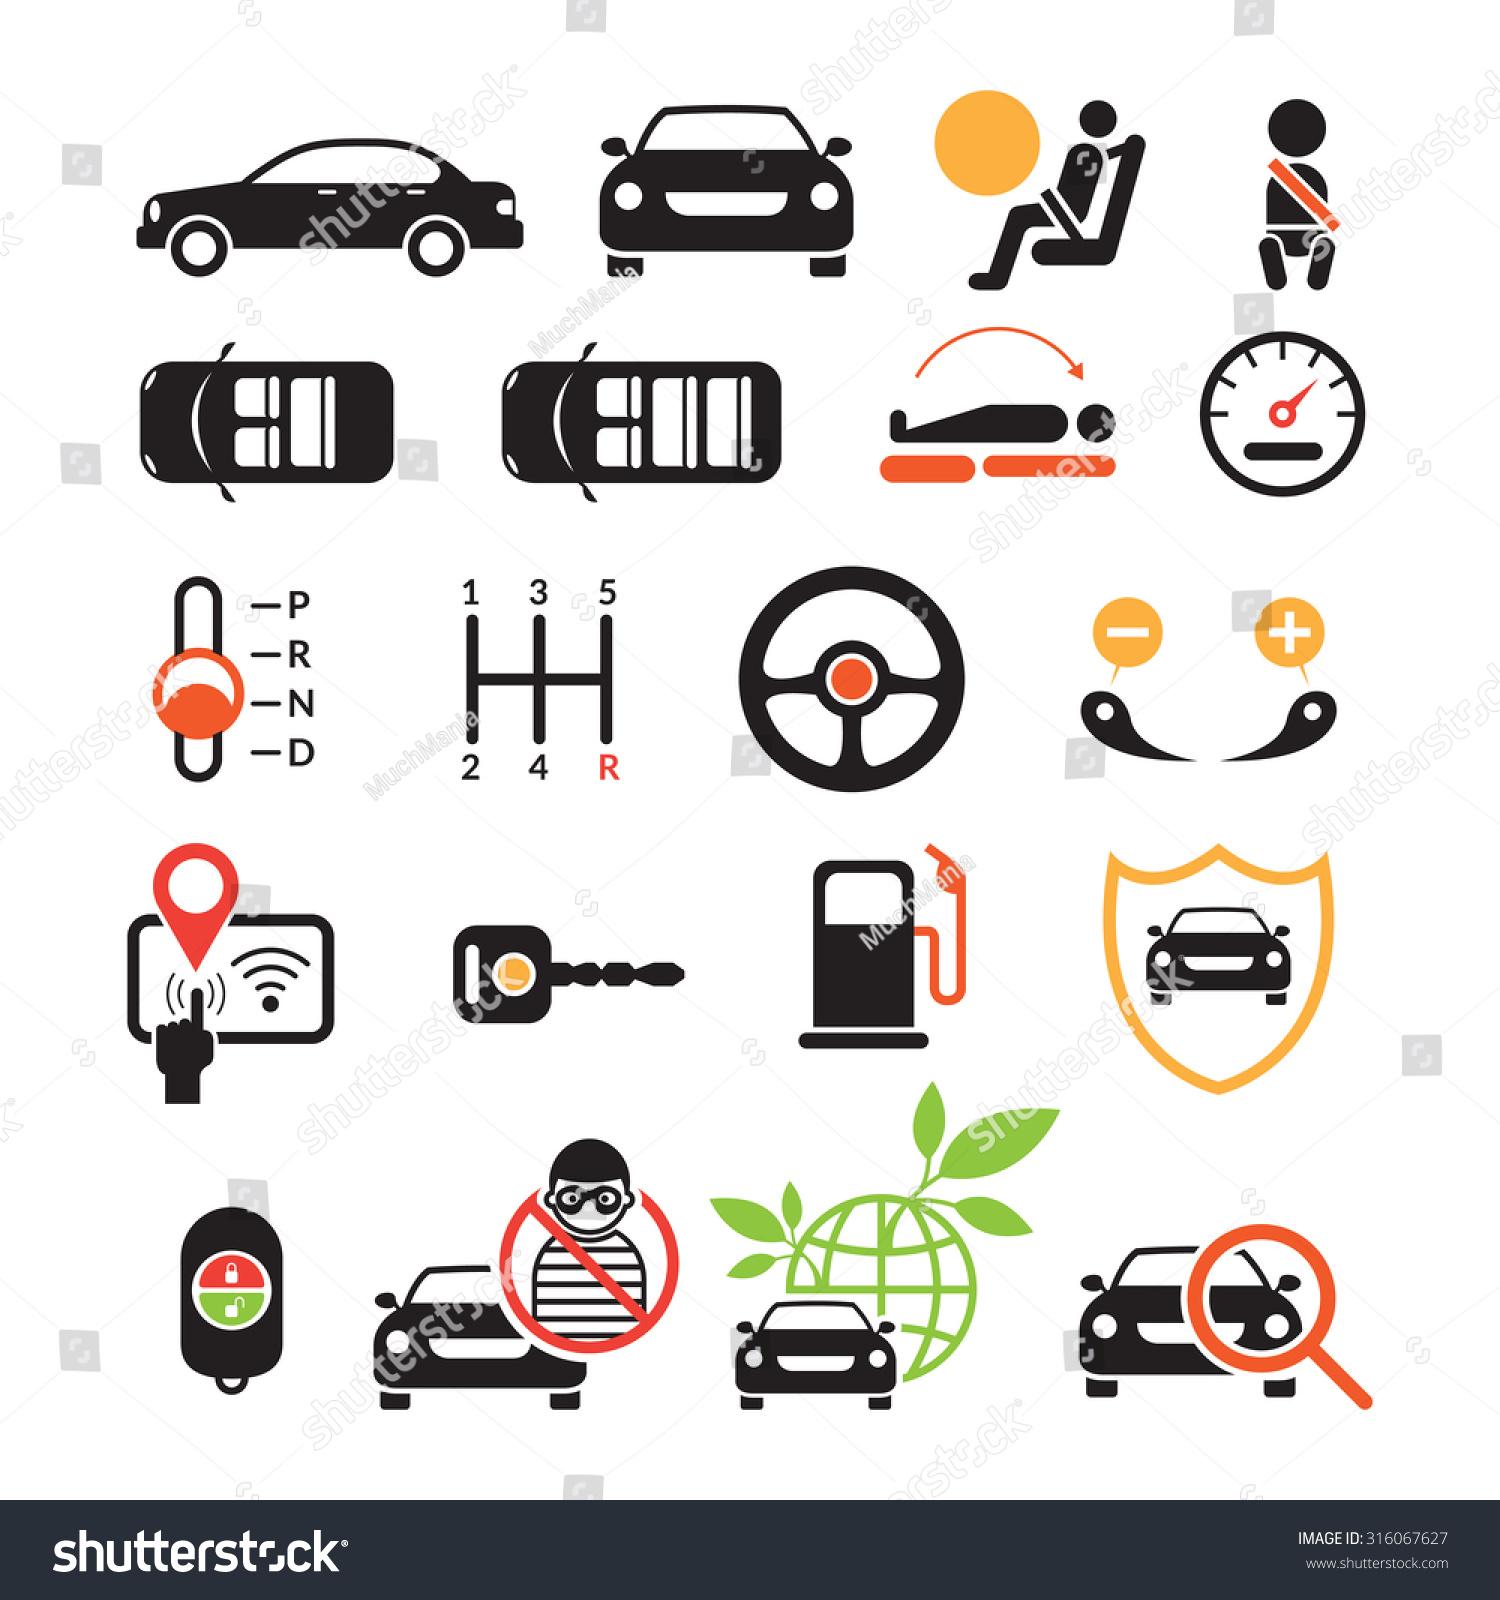 Auto trade stock options